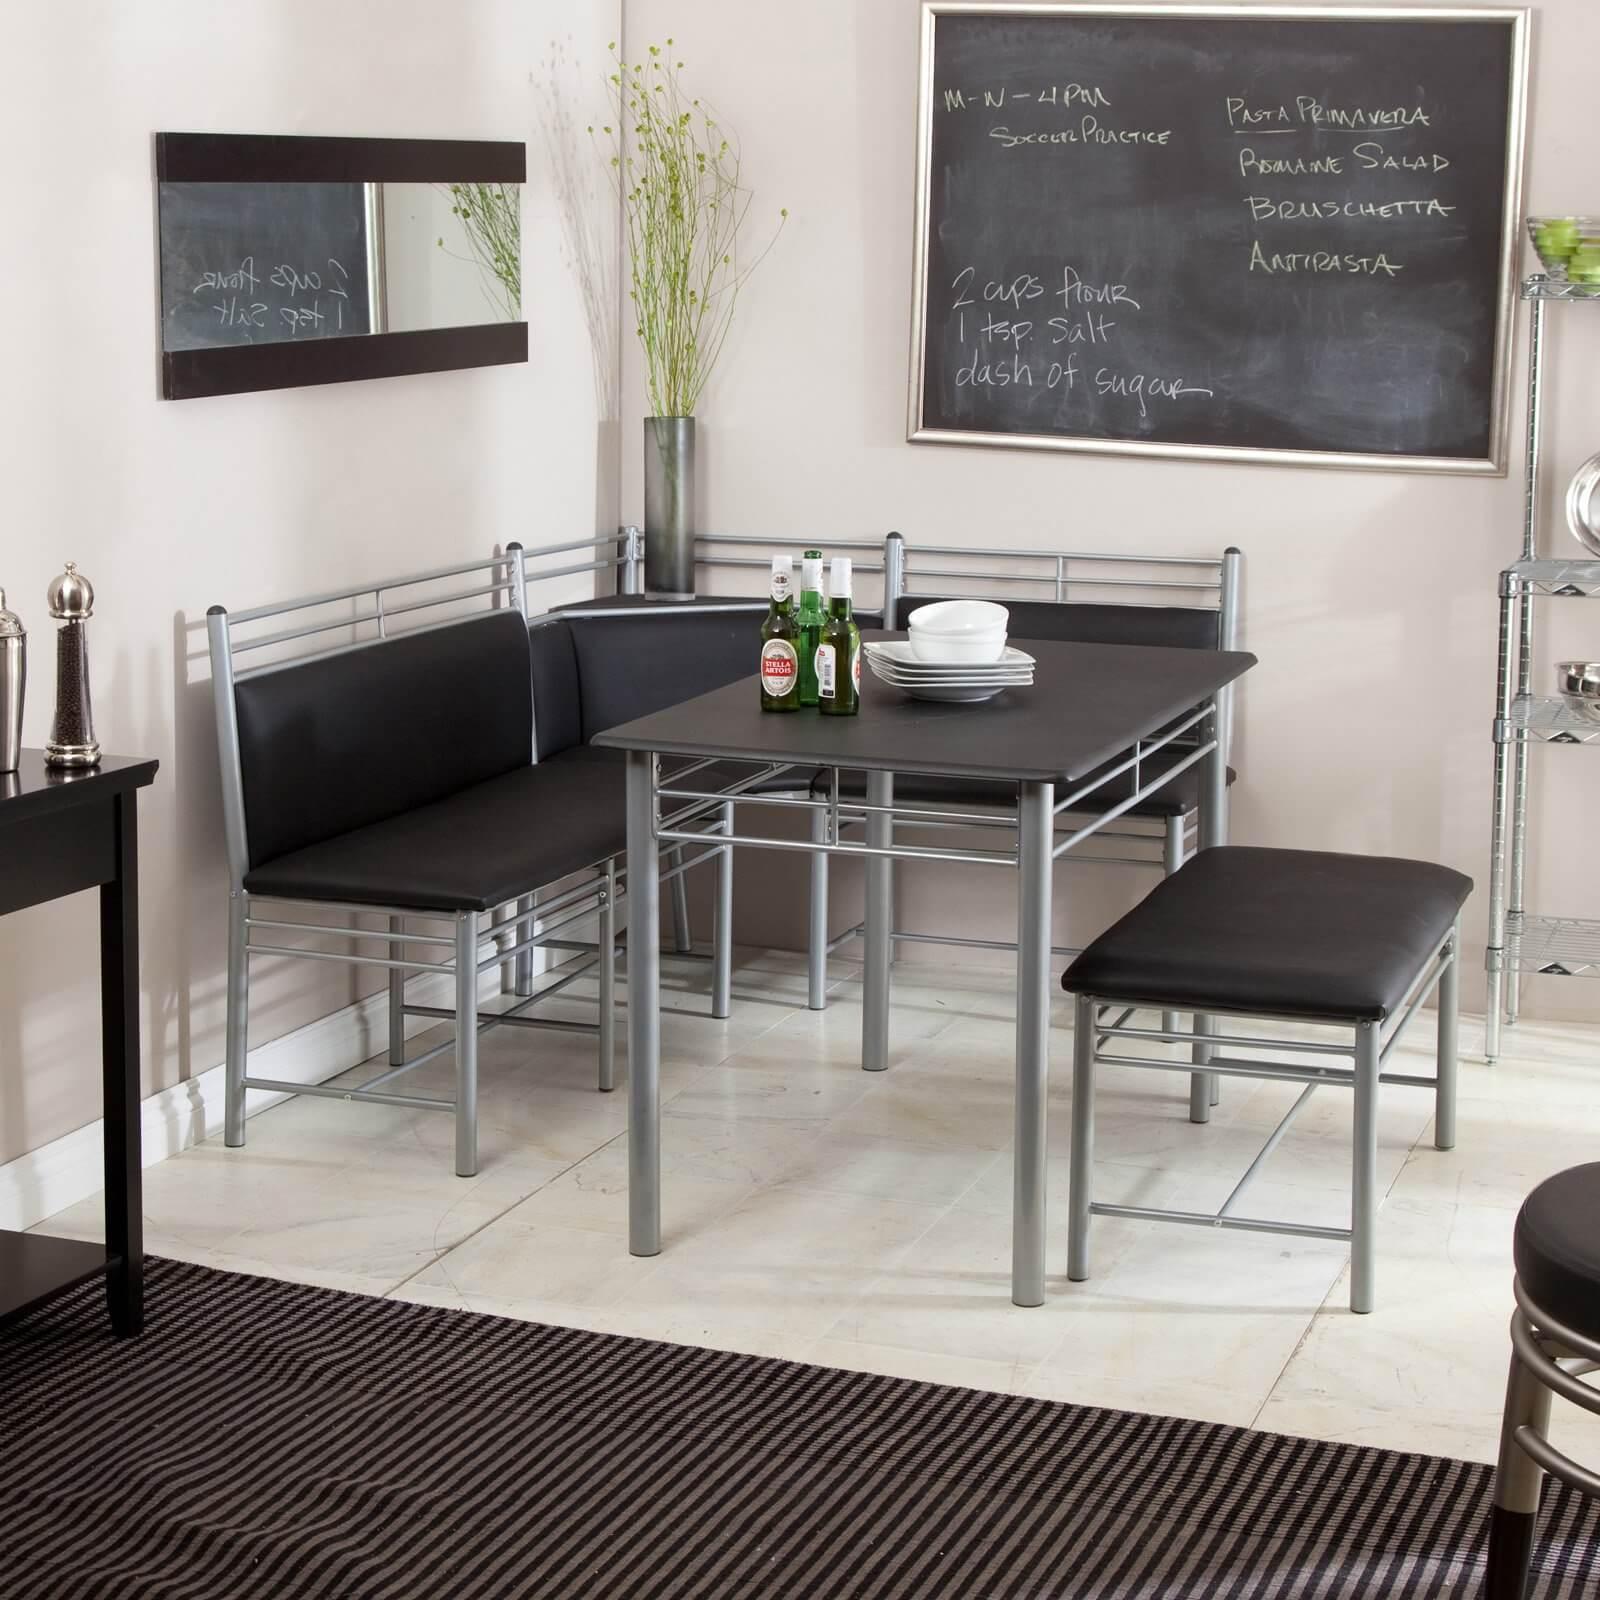 breakfast nook furniture sets kitchen tables 12 Modern Breakfast Nook Set